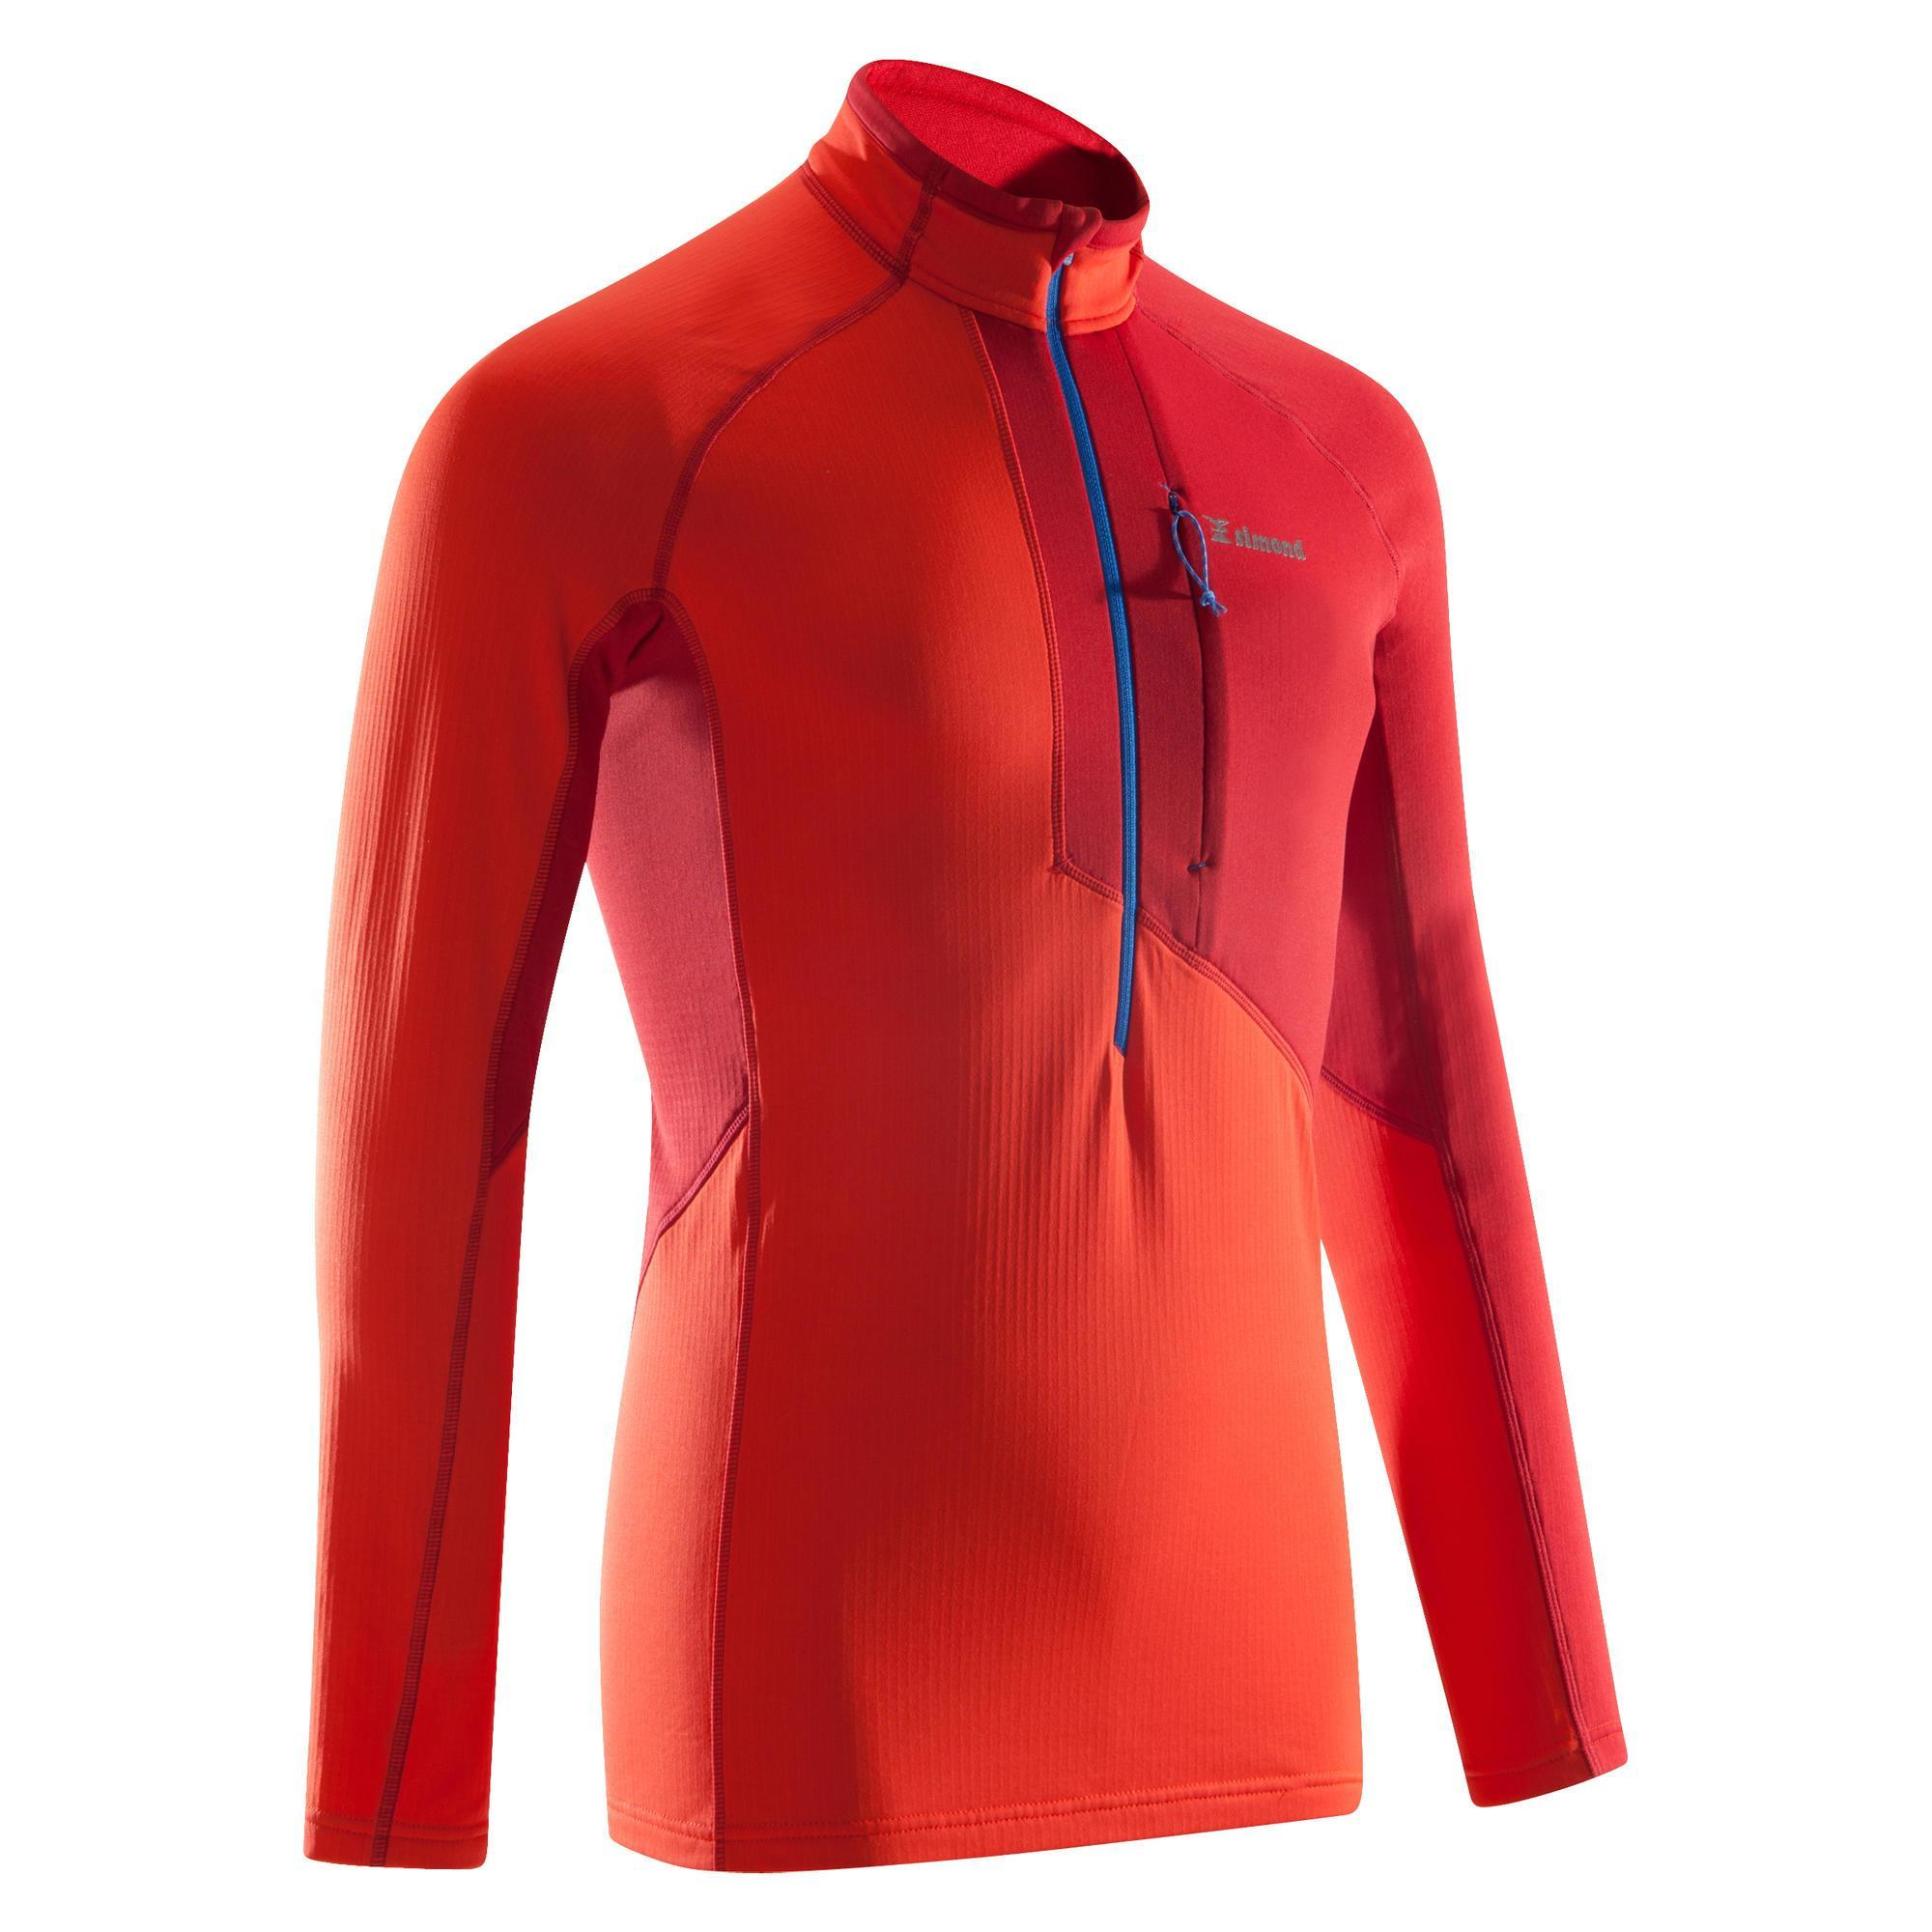 Klettershirt langarm Alpinism Herren | Sportbekleidung > Sportshirts > Klettershirts | Simond